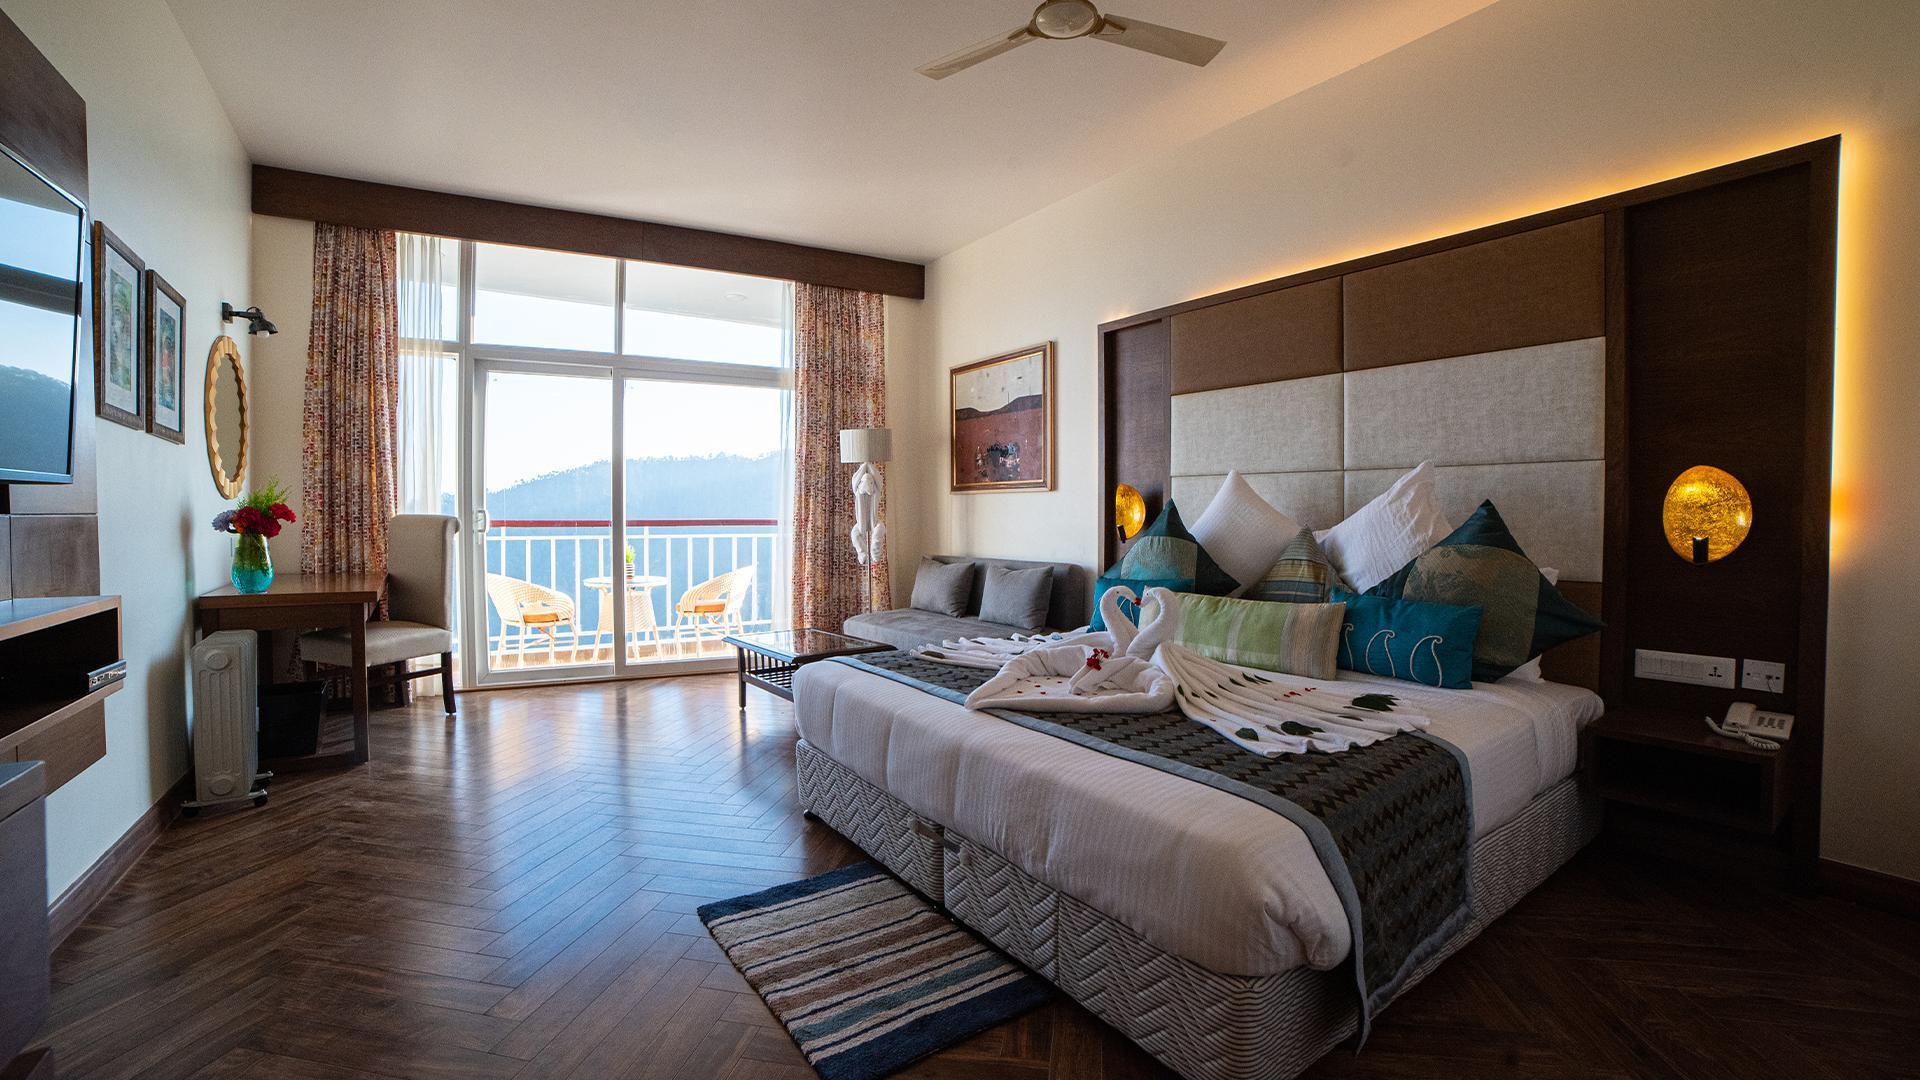 Deluxe Himalayan View Room with Balcony image 1 at jüSTa Mukteshwar Retreat & Spa by Nainital, Uttarakhand, India